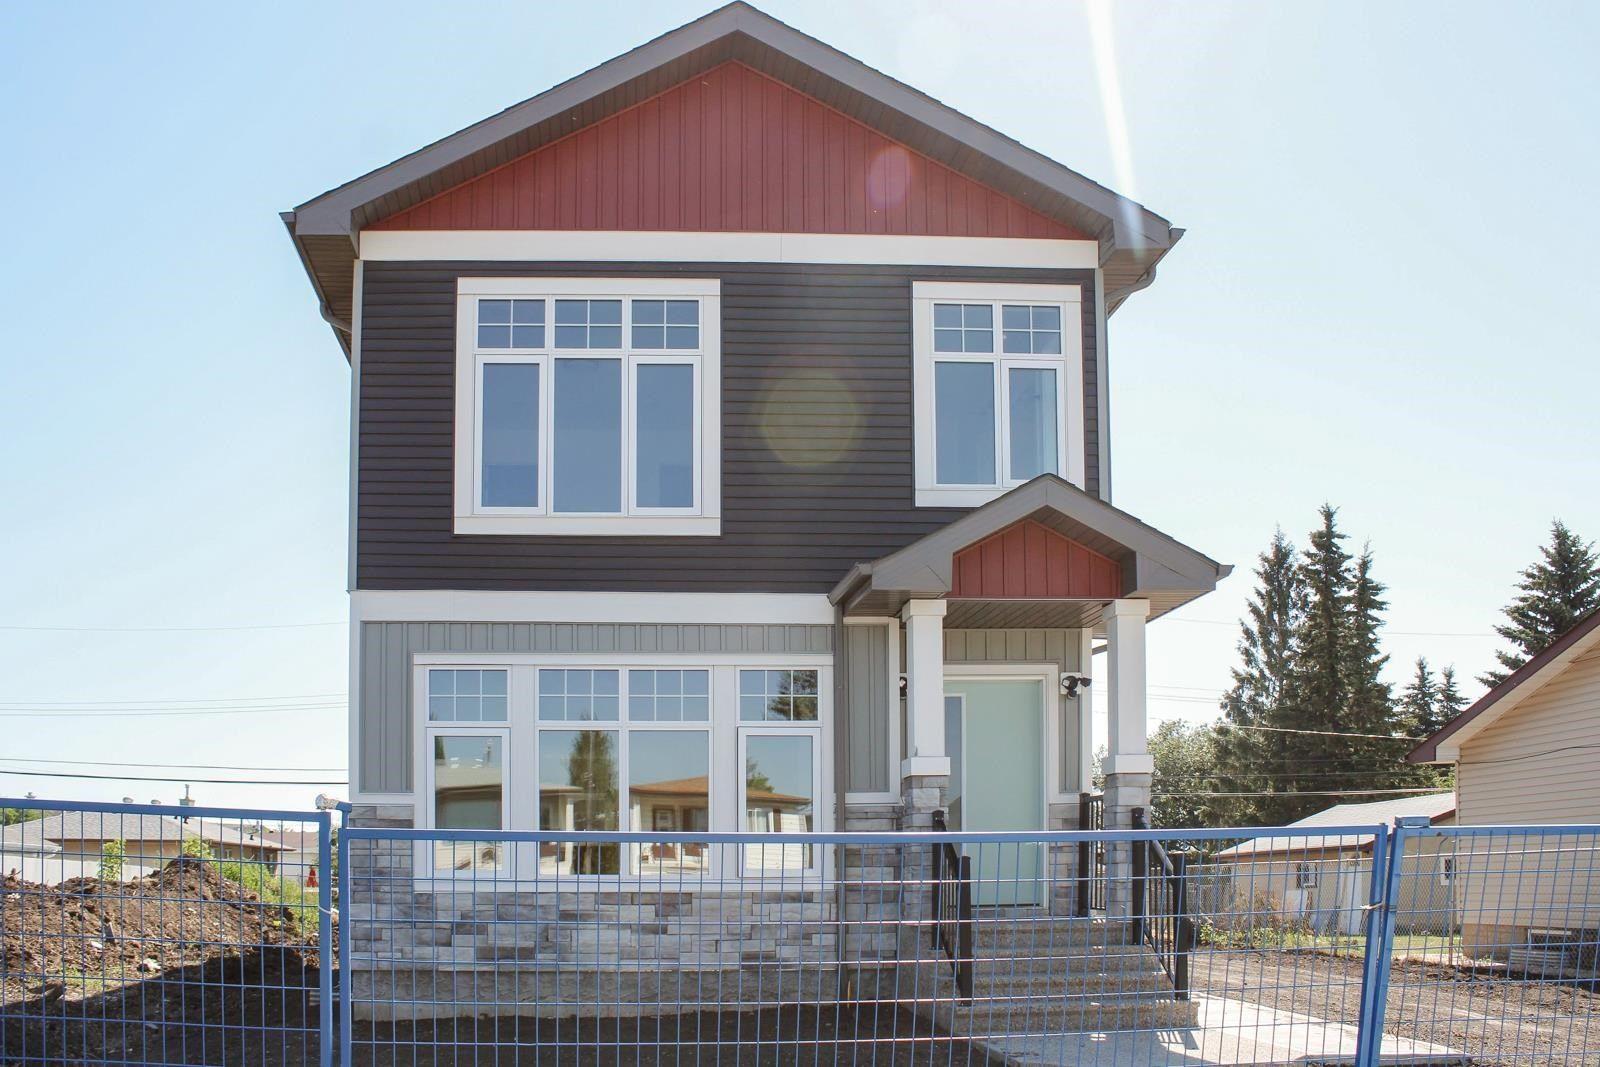 Main Photo: 13327 66 Street in Edmonton: Zone 02 House for sale : MLS®# E4252612